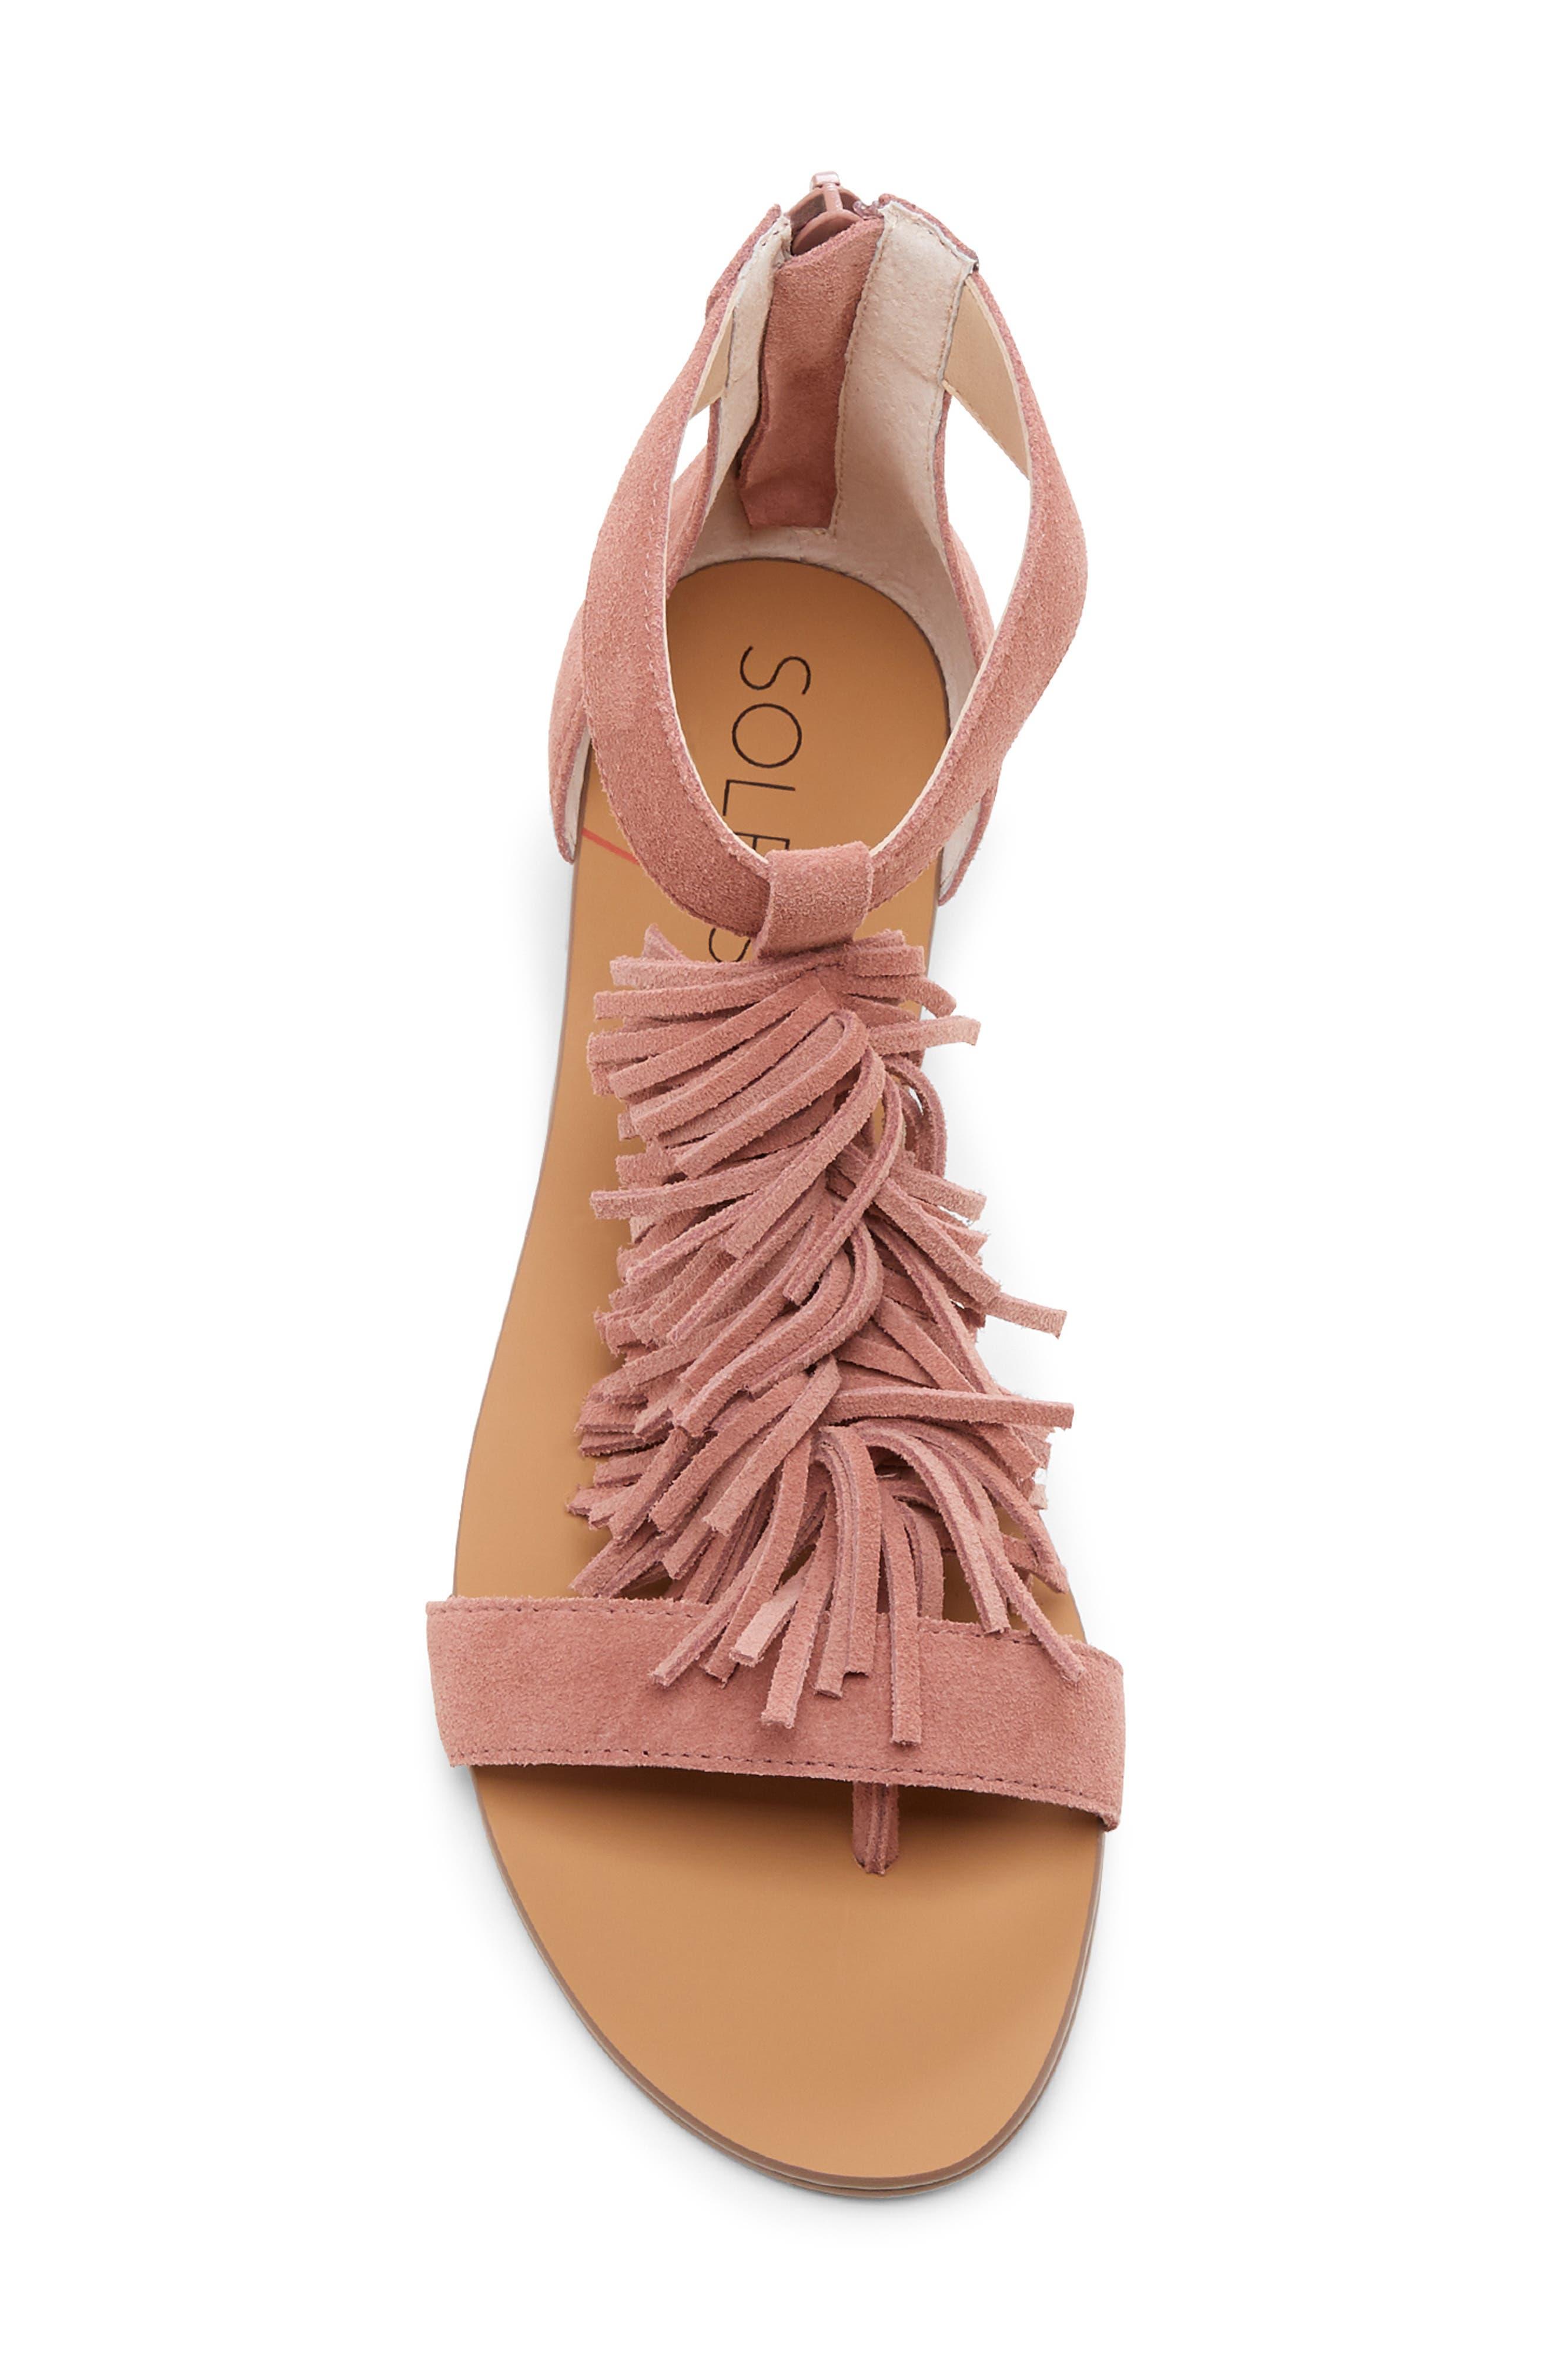 SOLE SOCIETY, 'Koa' Fringe T-Strap Flat Sandal, Alternate thumbnail 5, color, MOD MAUVE SUEDE